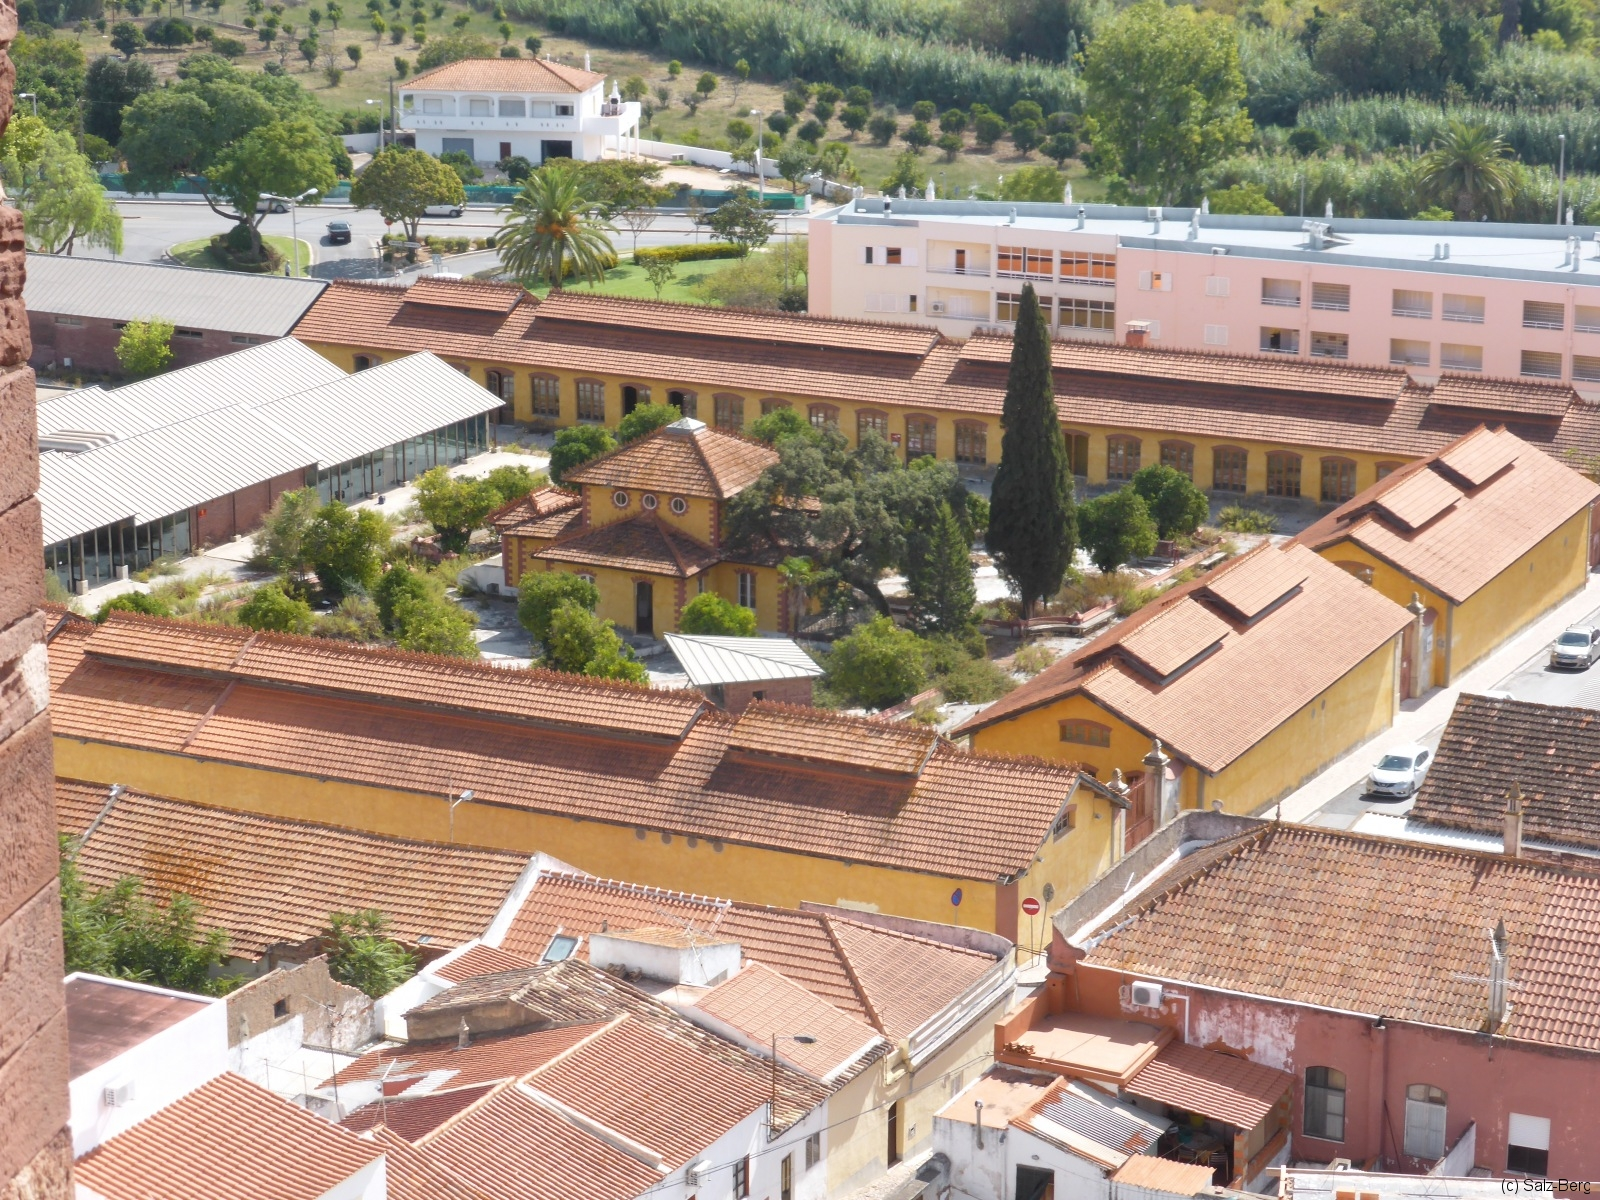 Algarve-293-P1050820